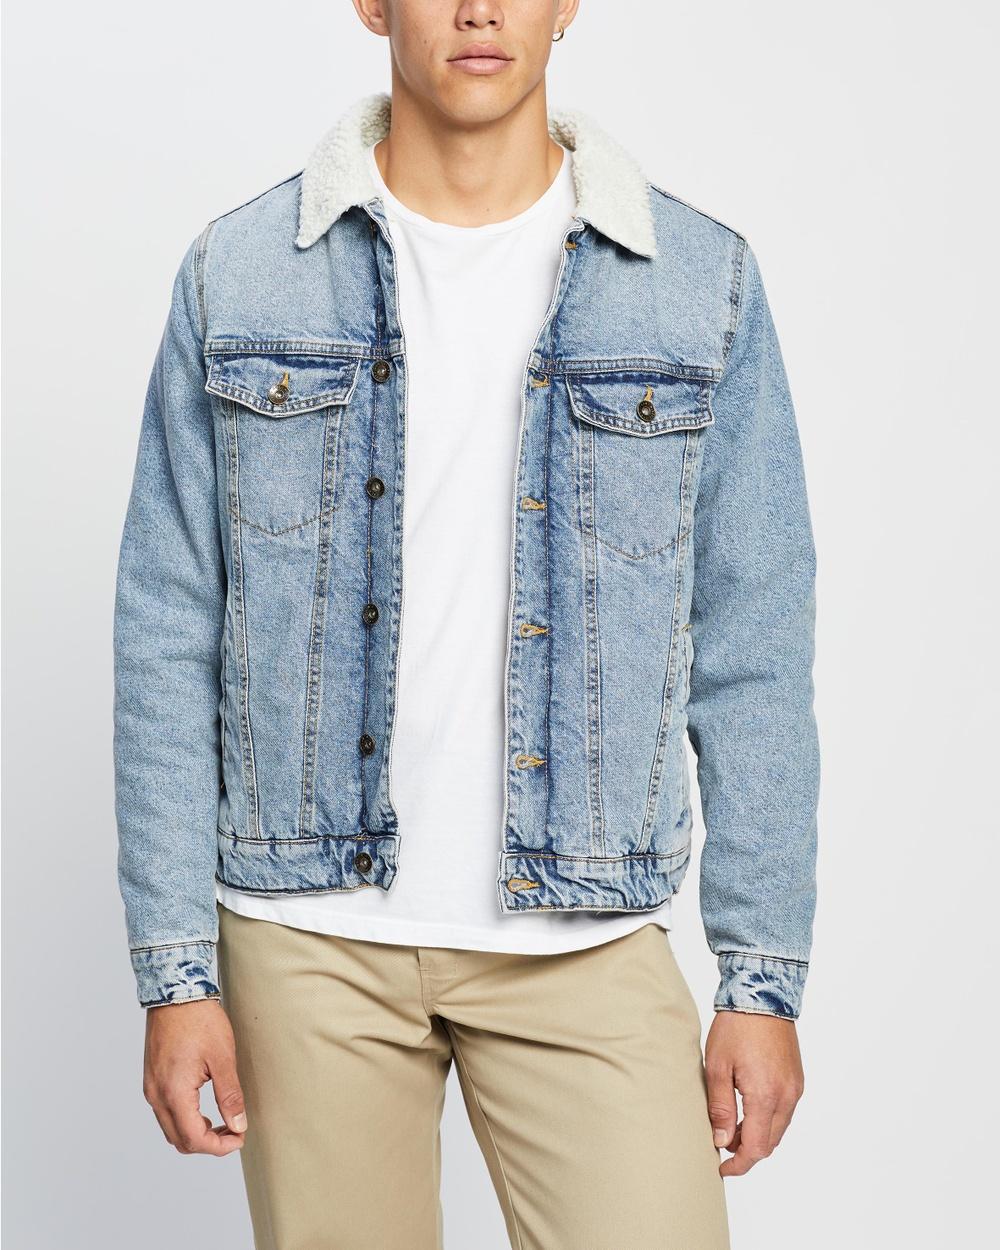 Cotton On Borg Denim Jacket jacket Distressed Blue Australia